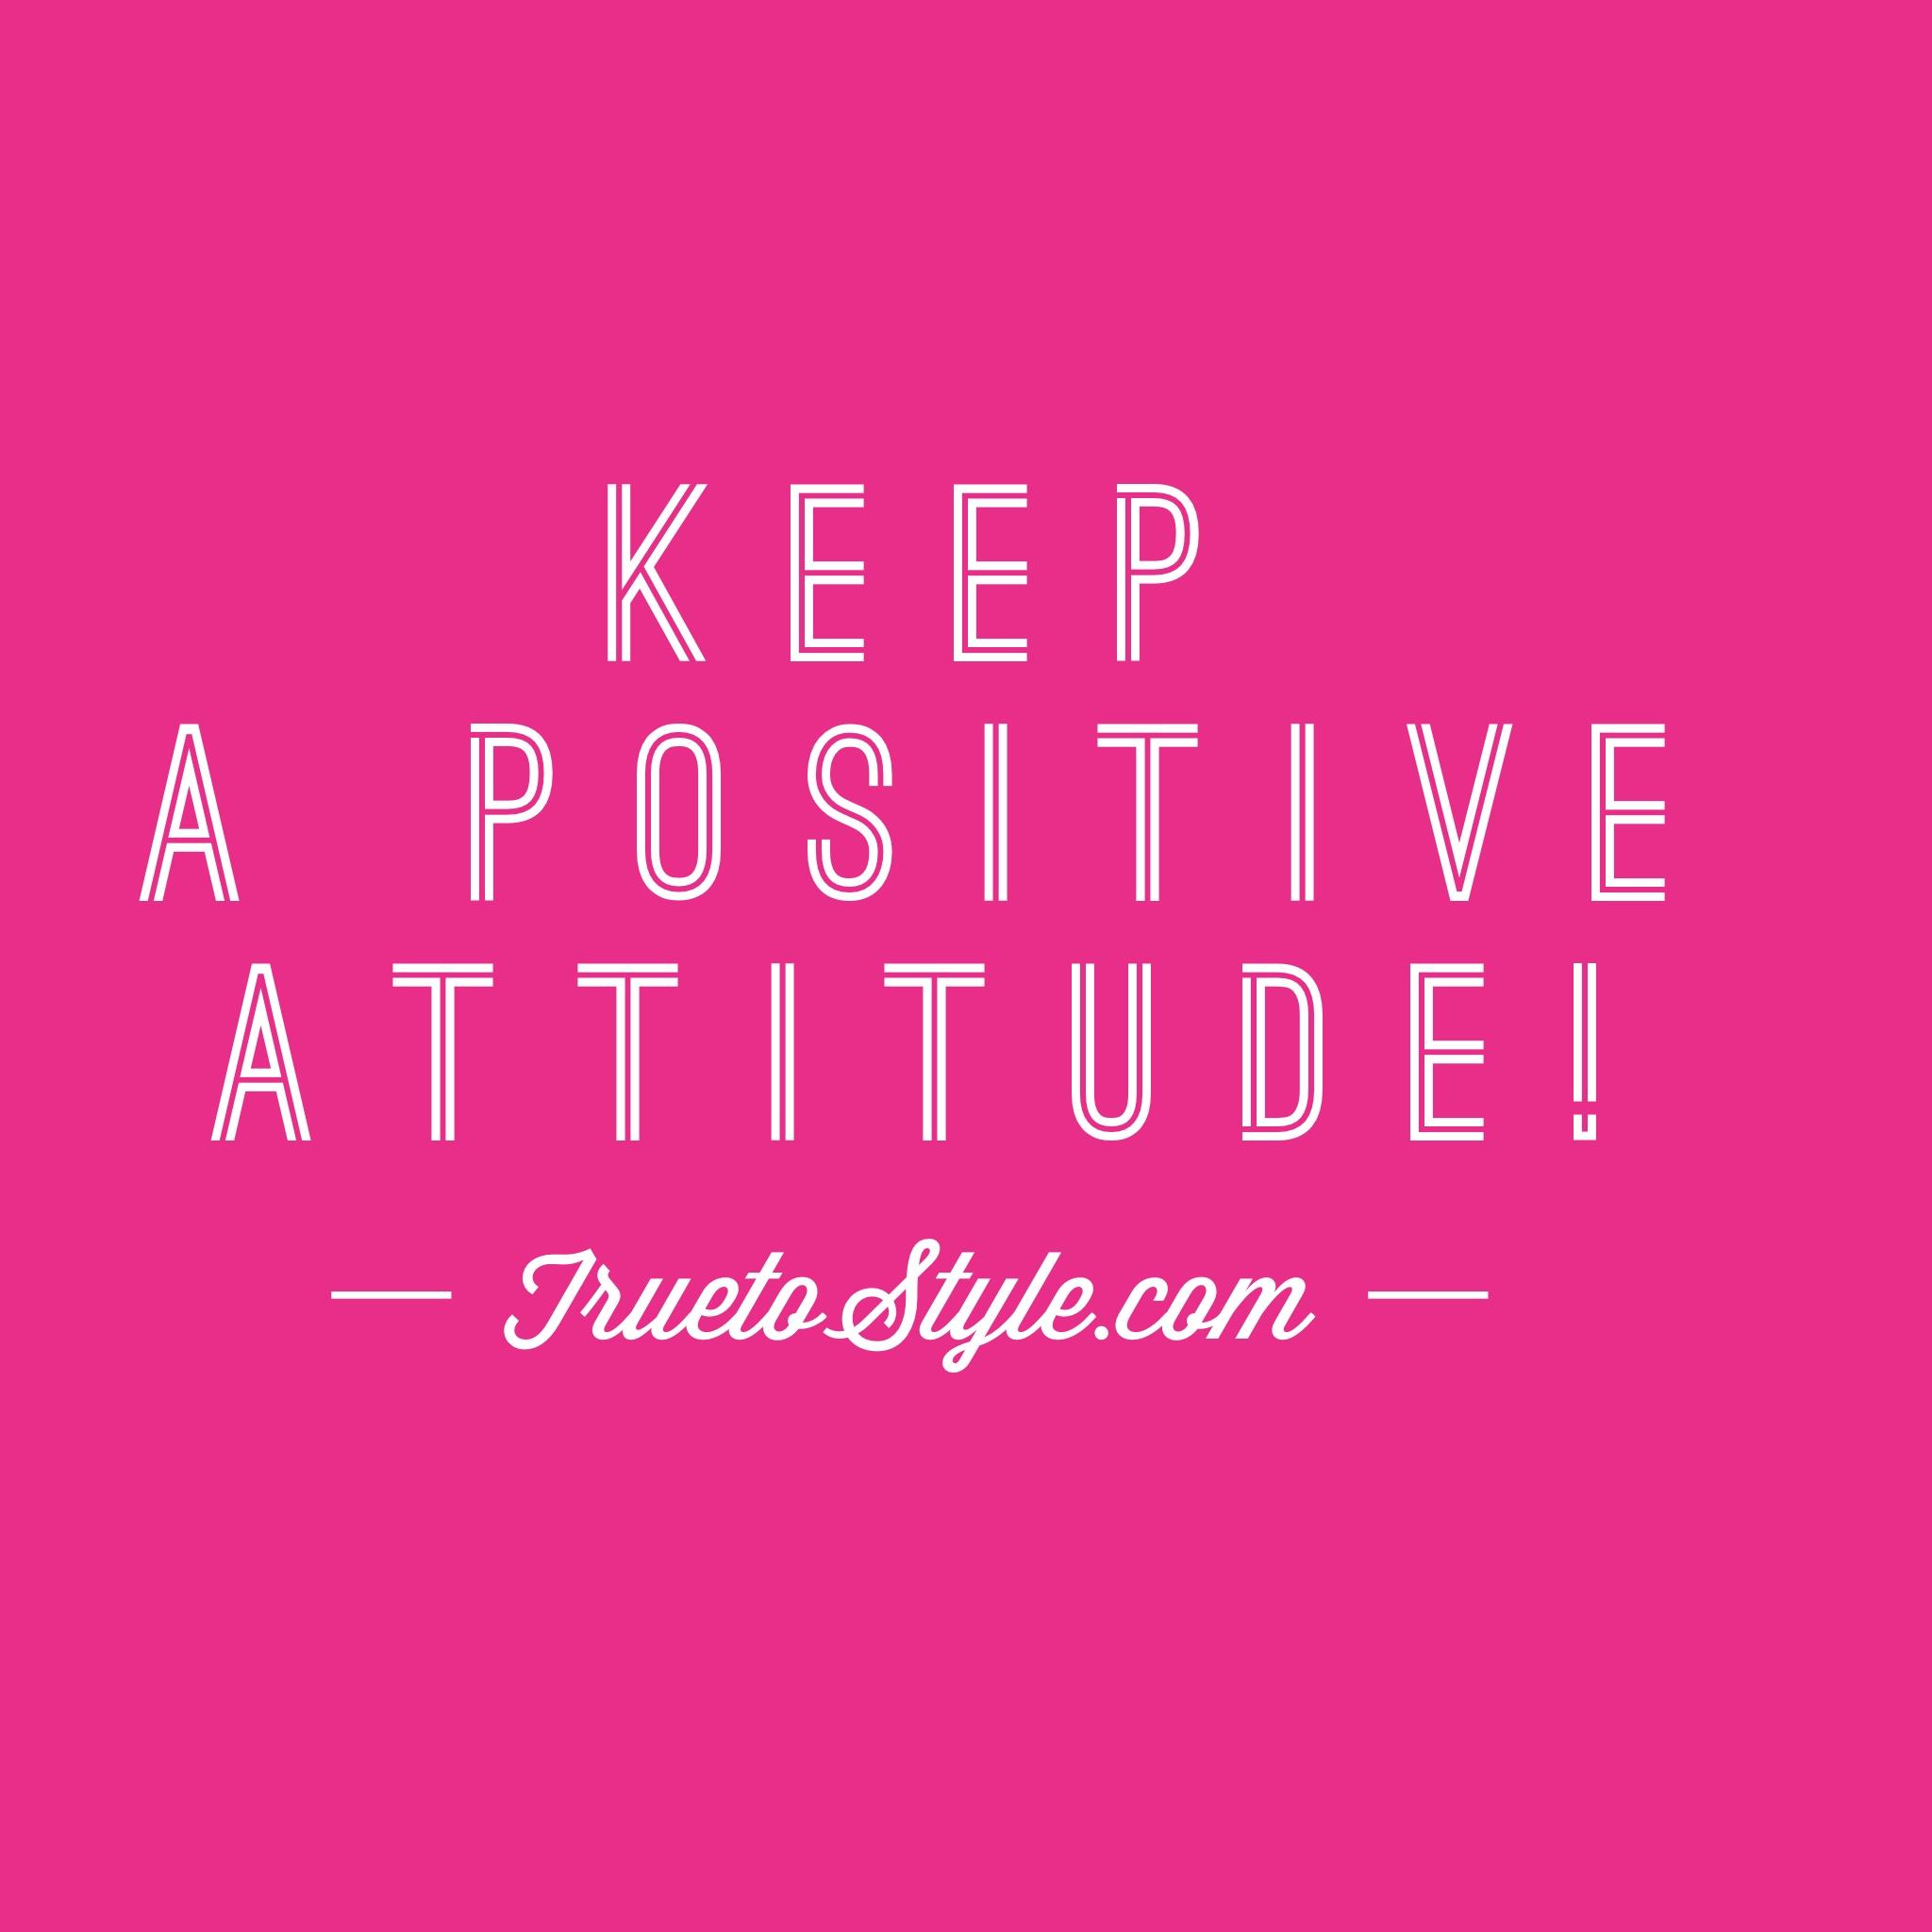 Positive Attitude Challenge